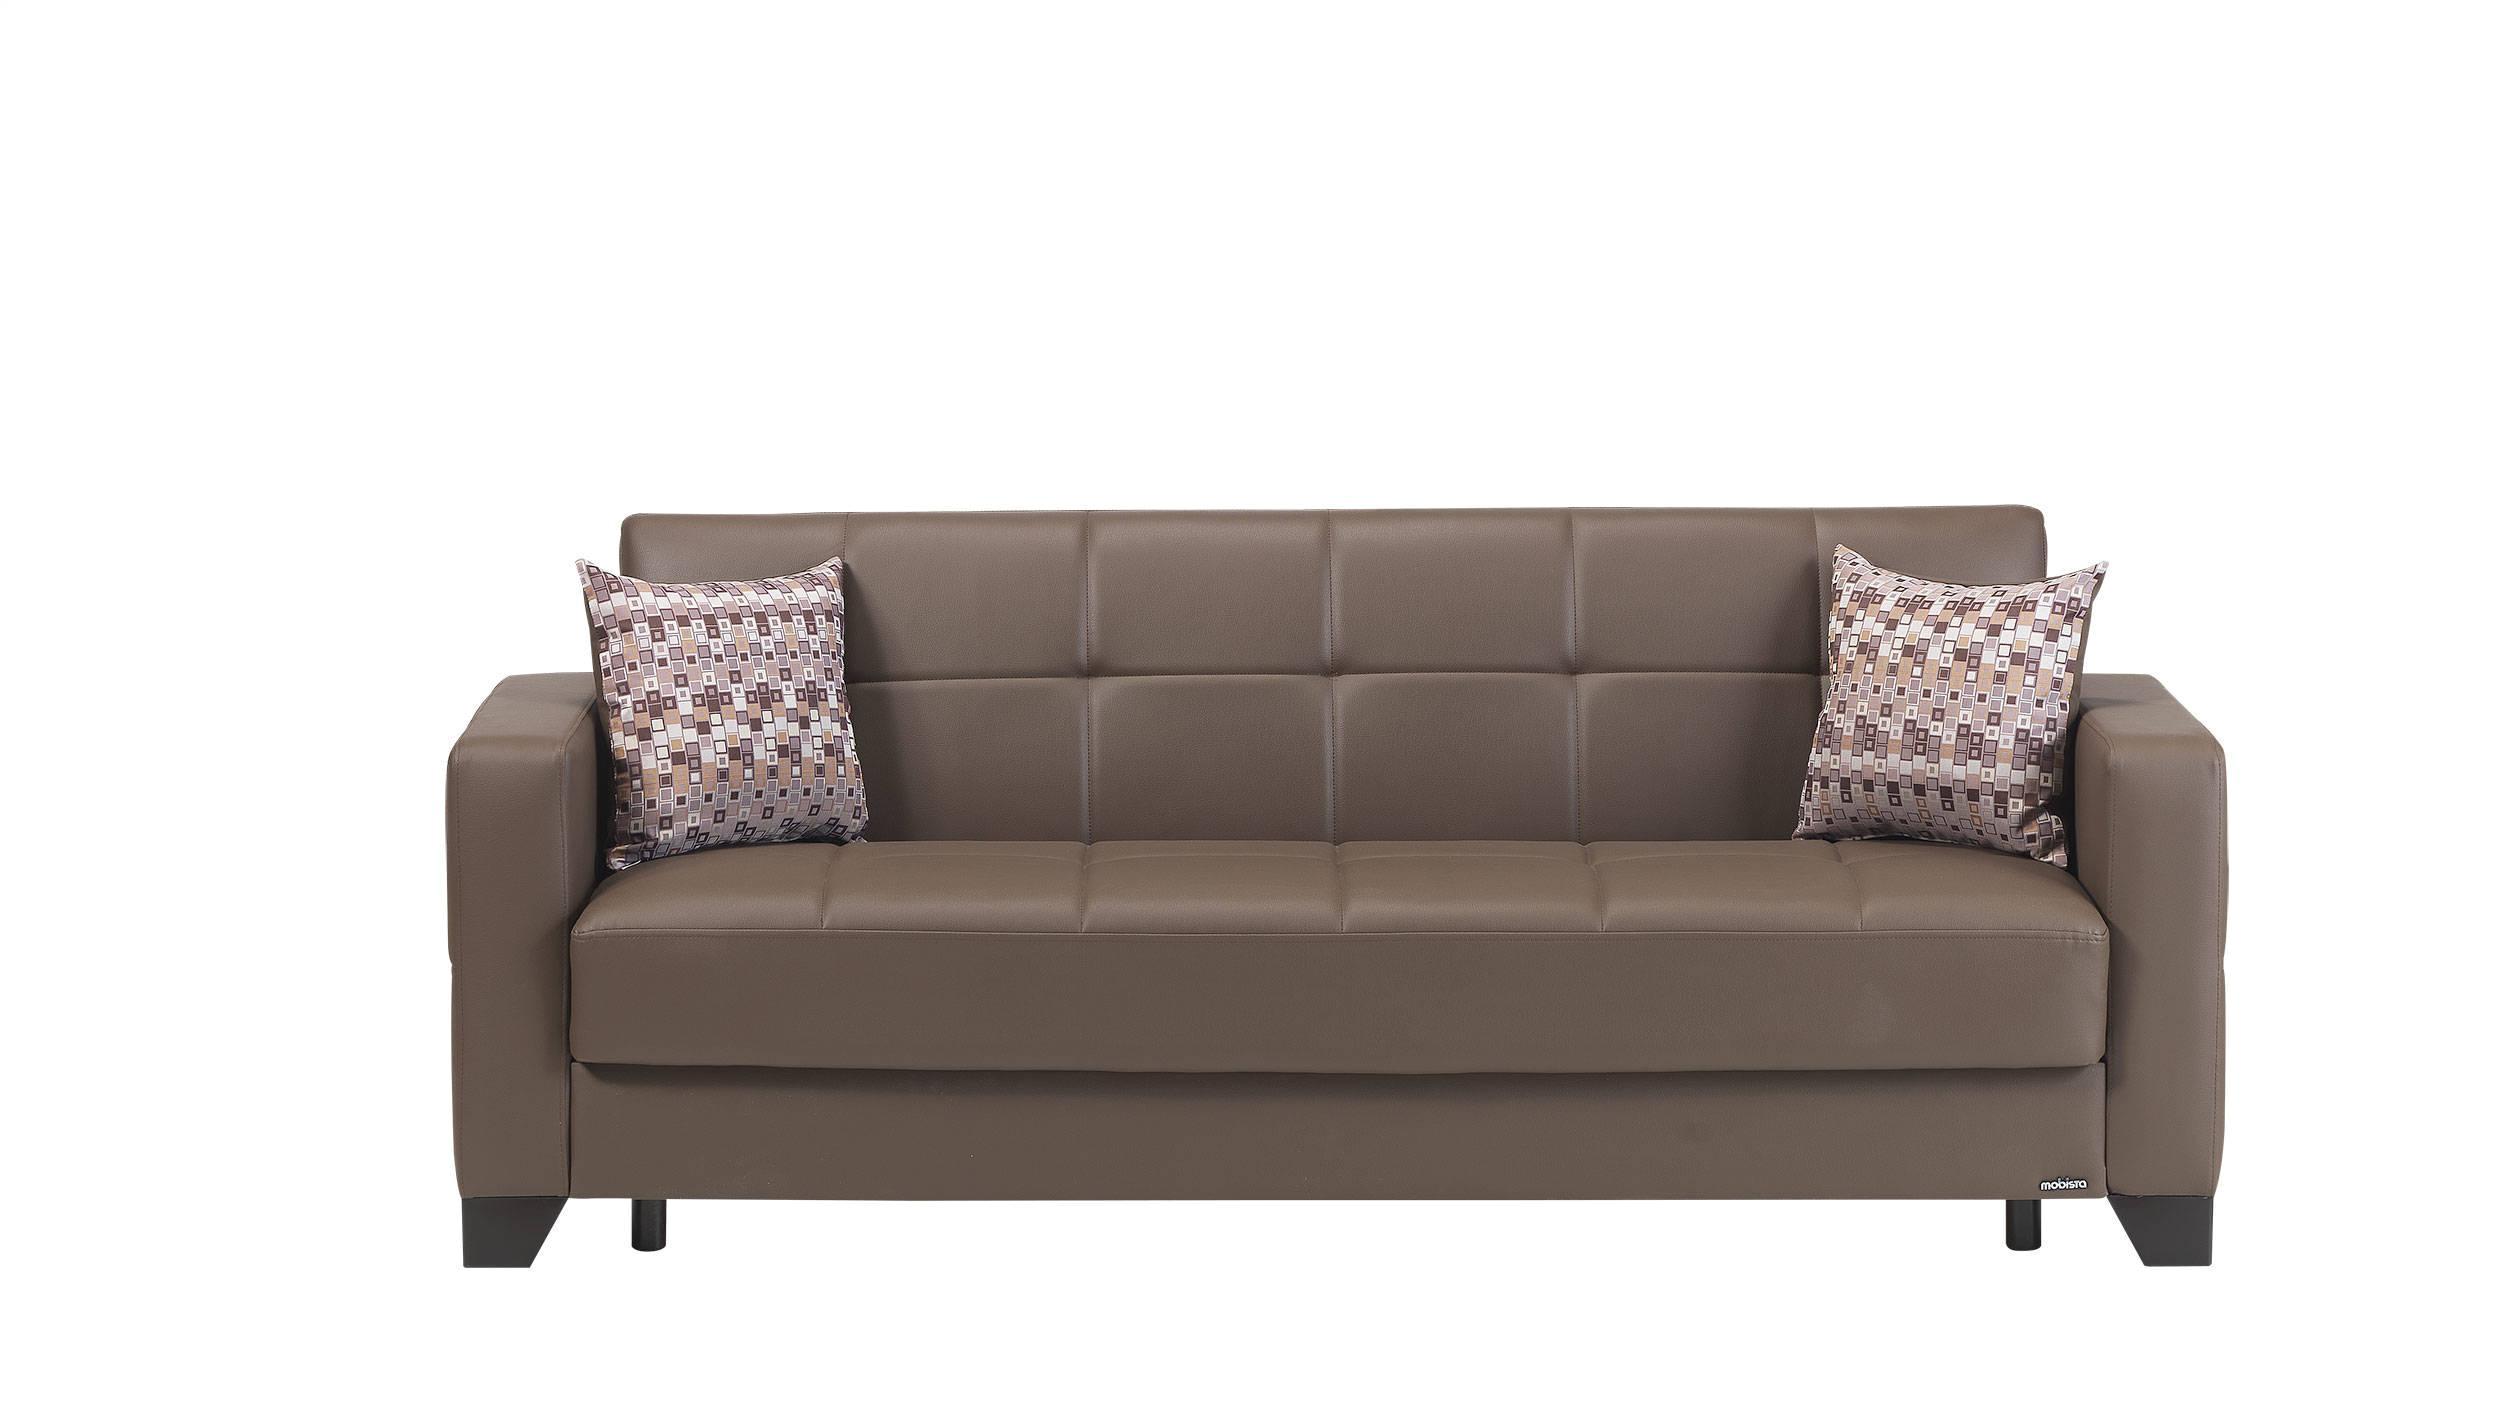 Affordable Sectional sofas Best Big sofa Leder Patio sofas Awesome Wicker Outdoor sofa 0d Patio